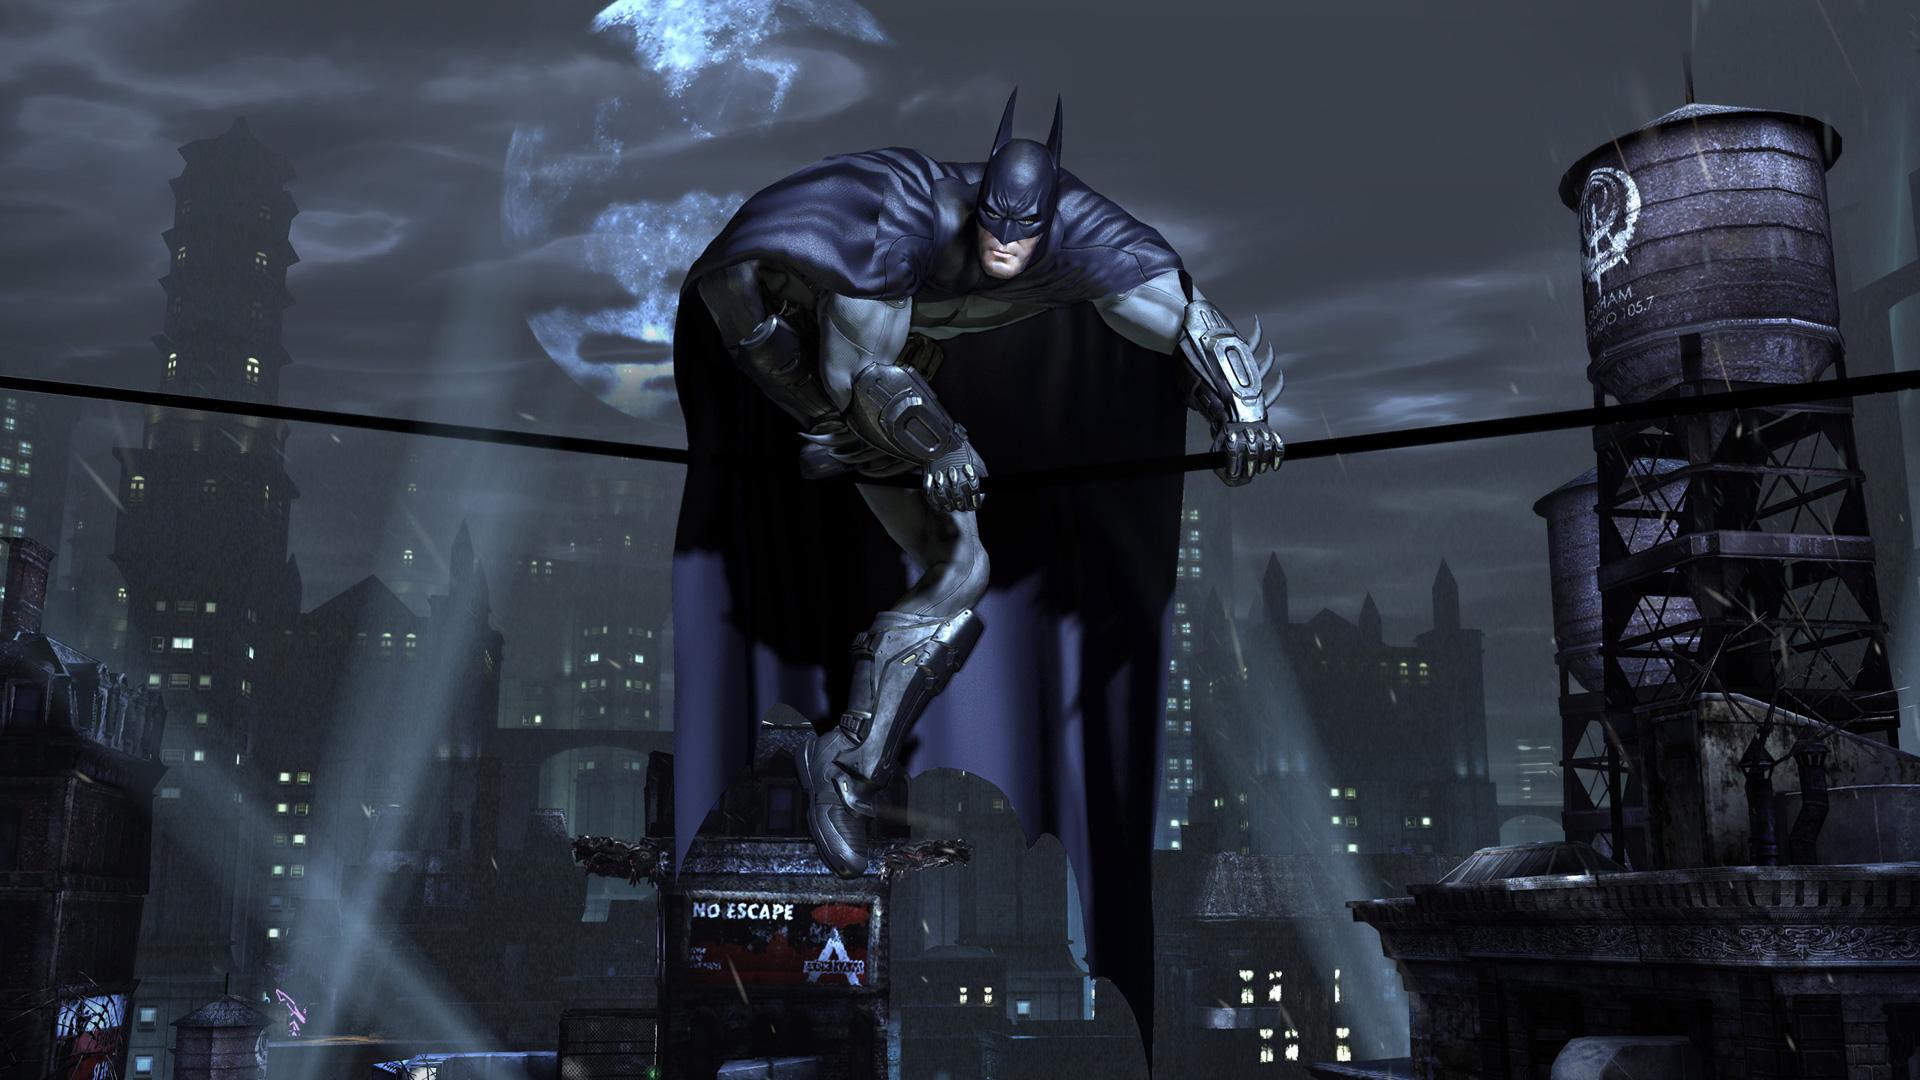 Batman Arkham City Wallpaper Hd 1080p Skinit 17588 Hd Wallpapers 1920x1080